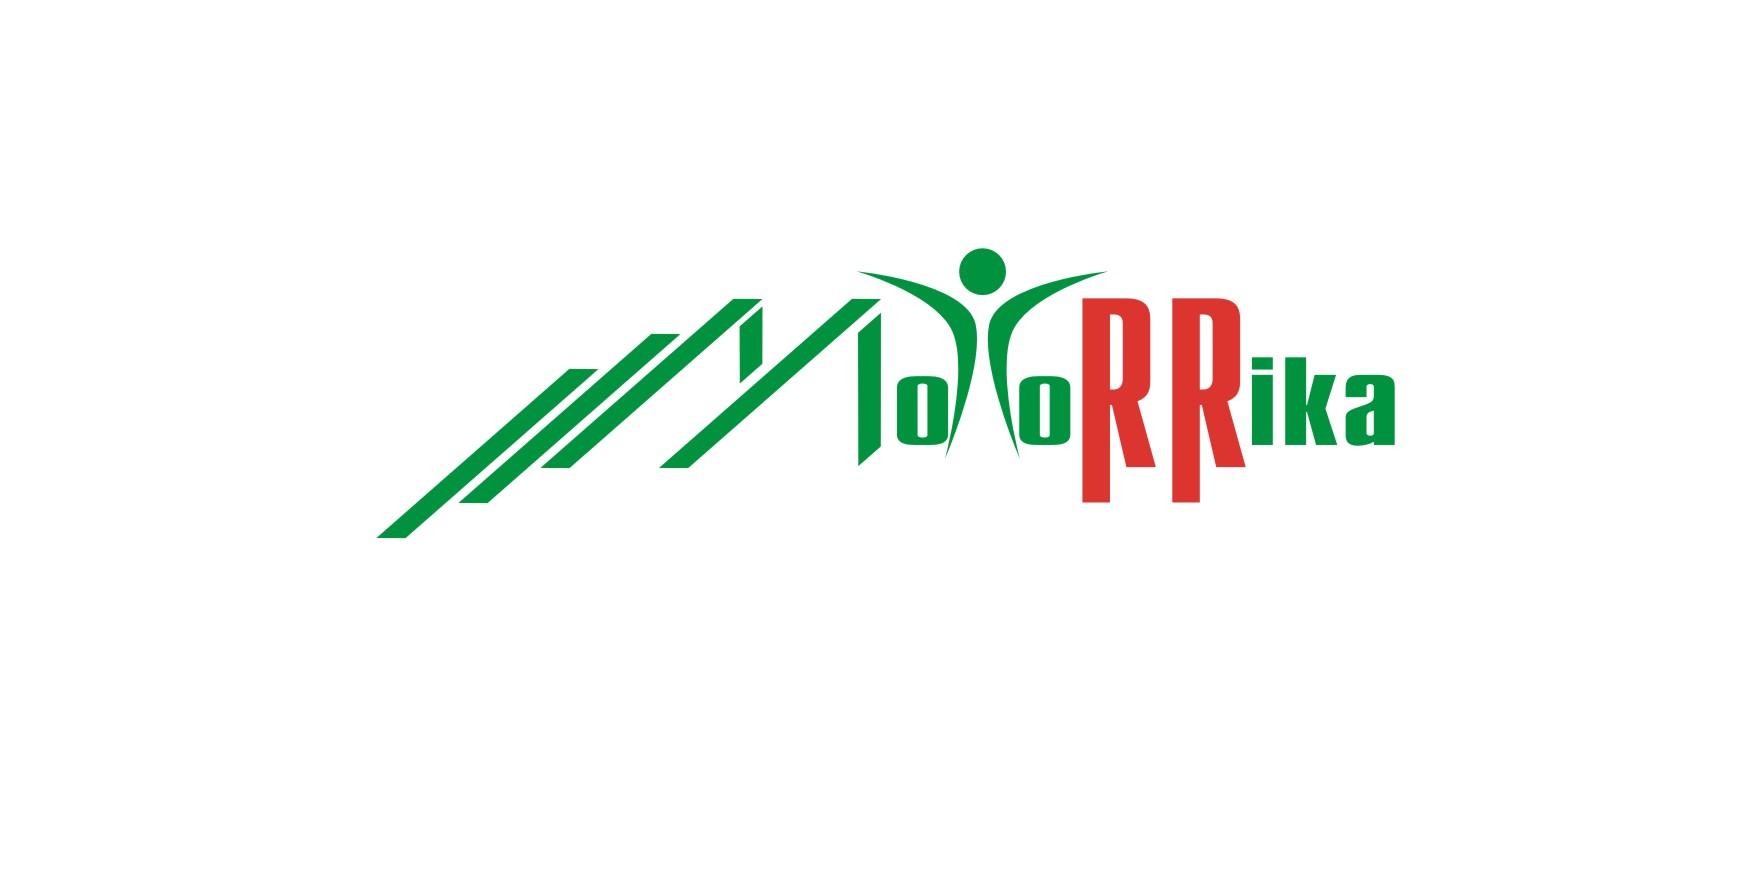 Мотогонки. Логотип, фирменный стиль. фото f_4dbd3a4f81a1d.jpg